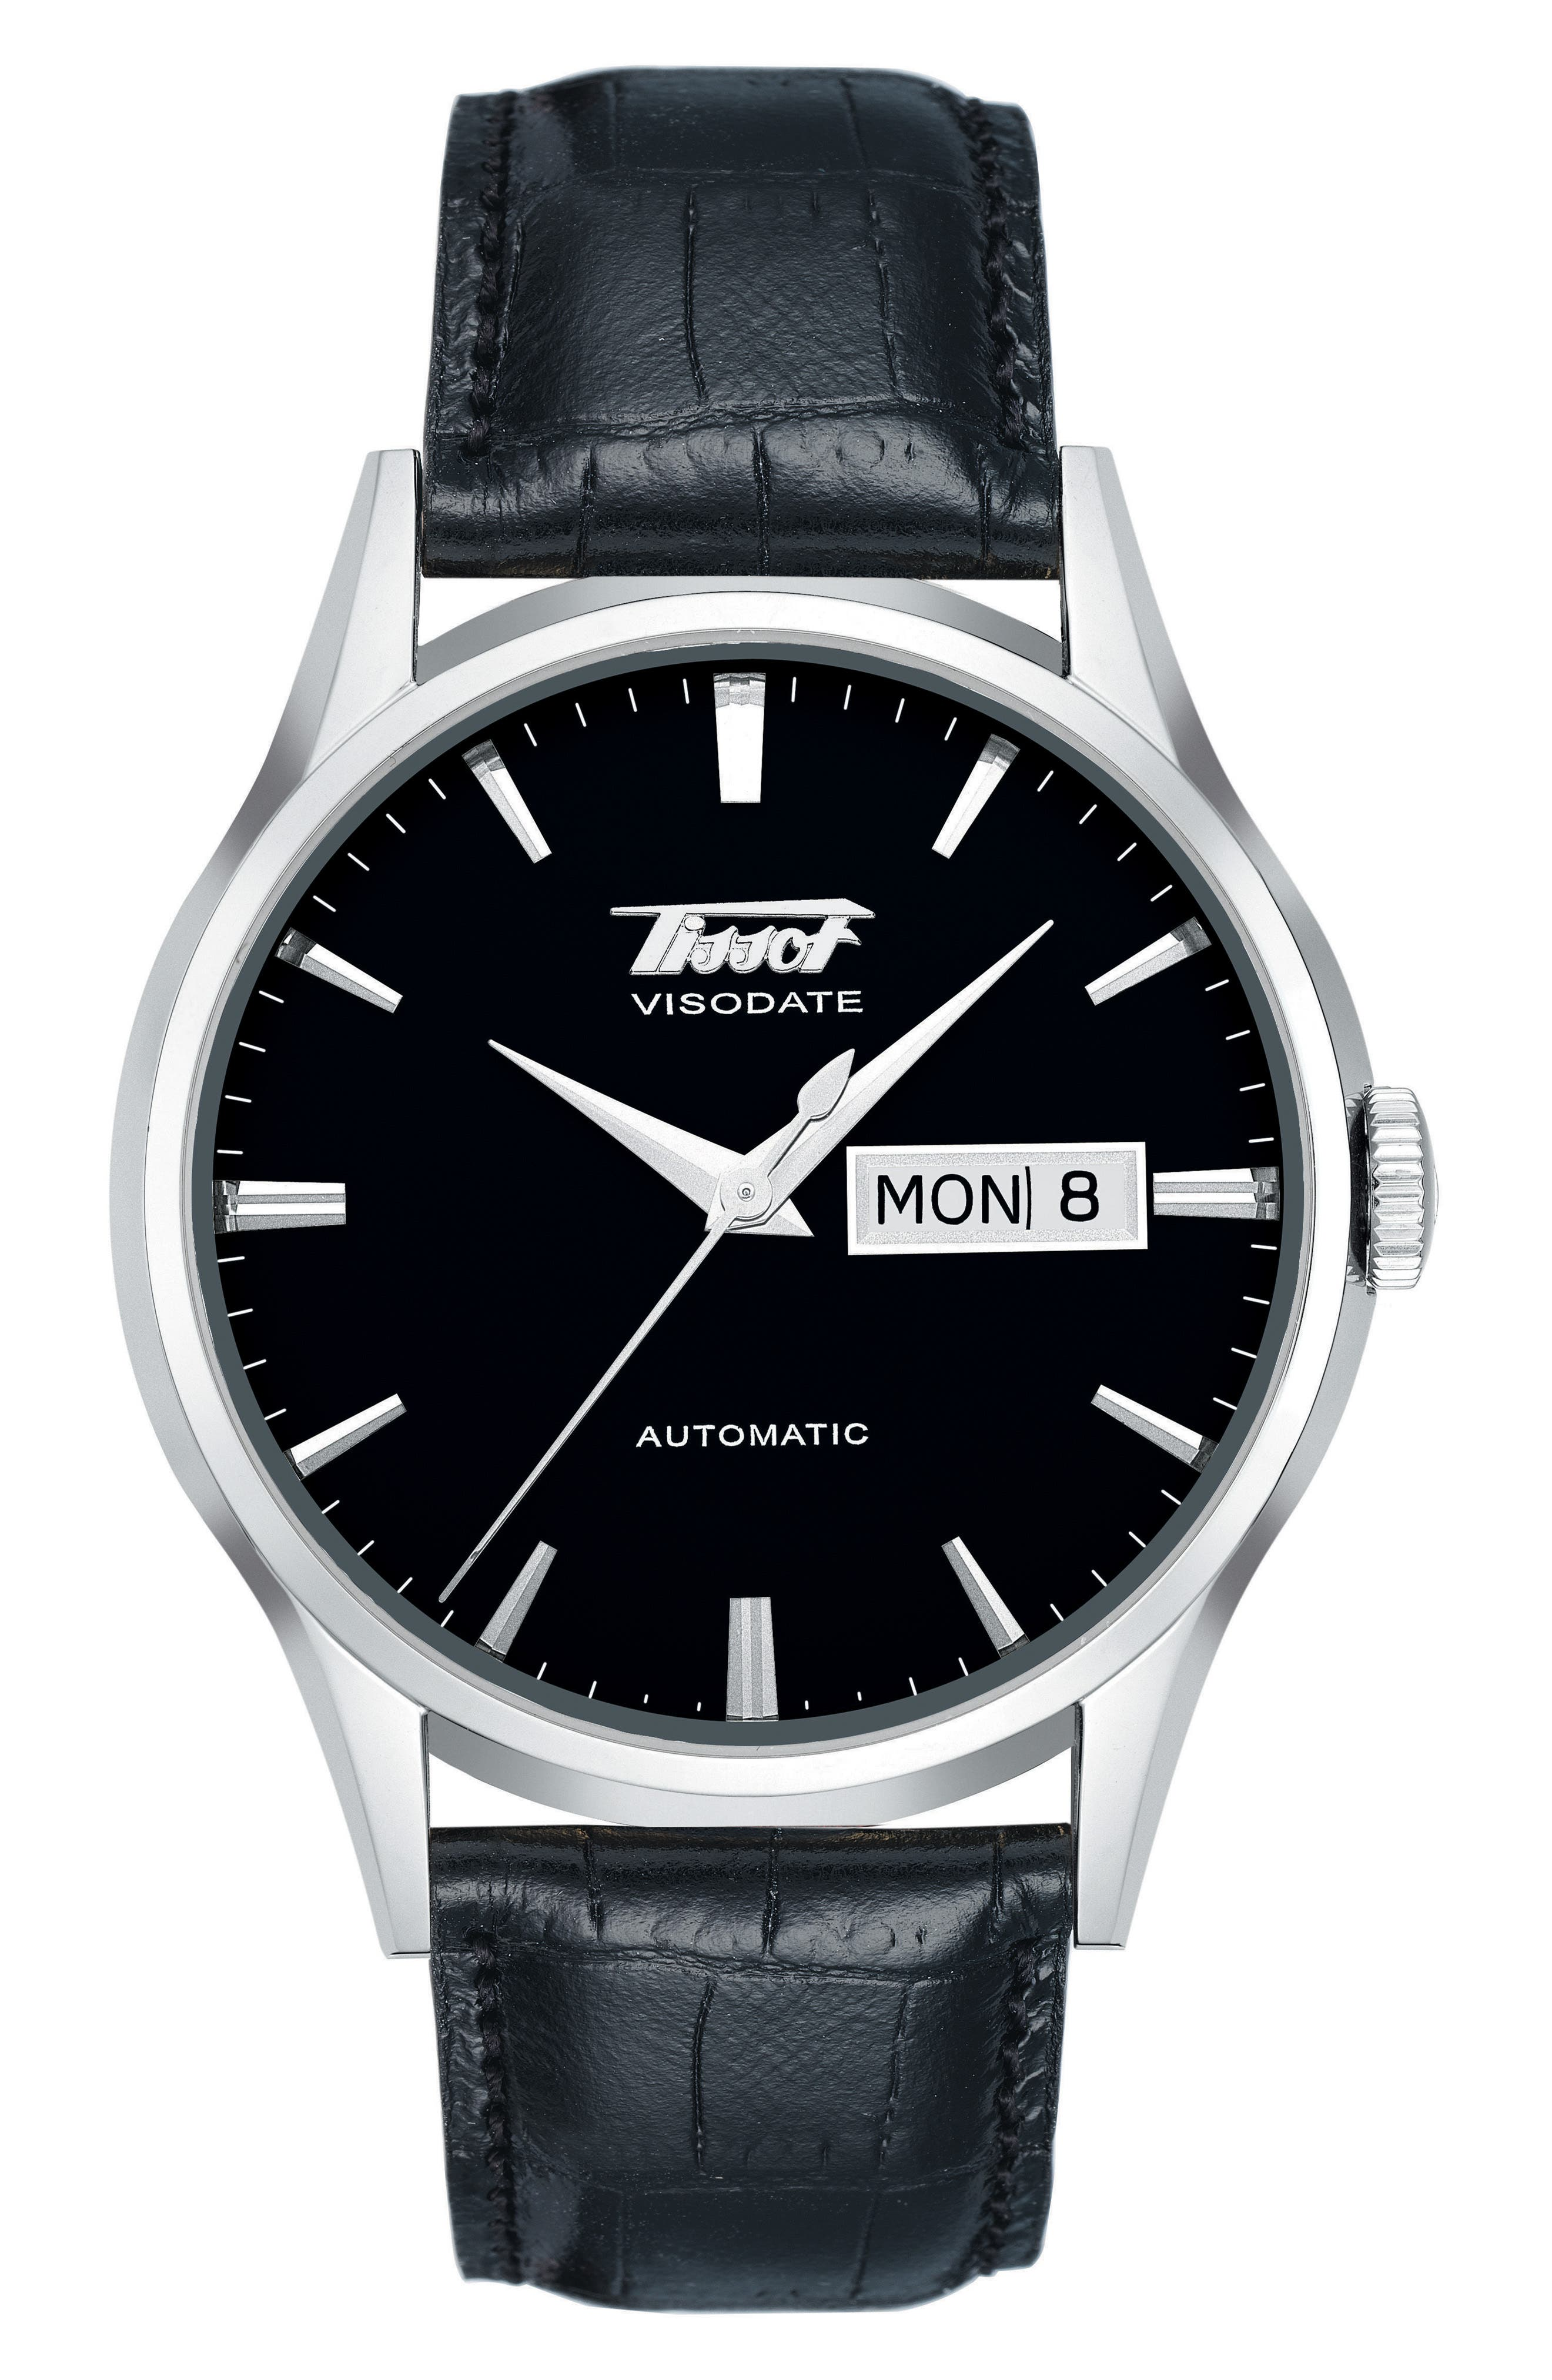 Main Image - Tissot Heritage Visodate Automatic Watch, 40mm